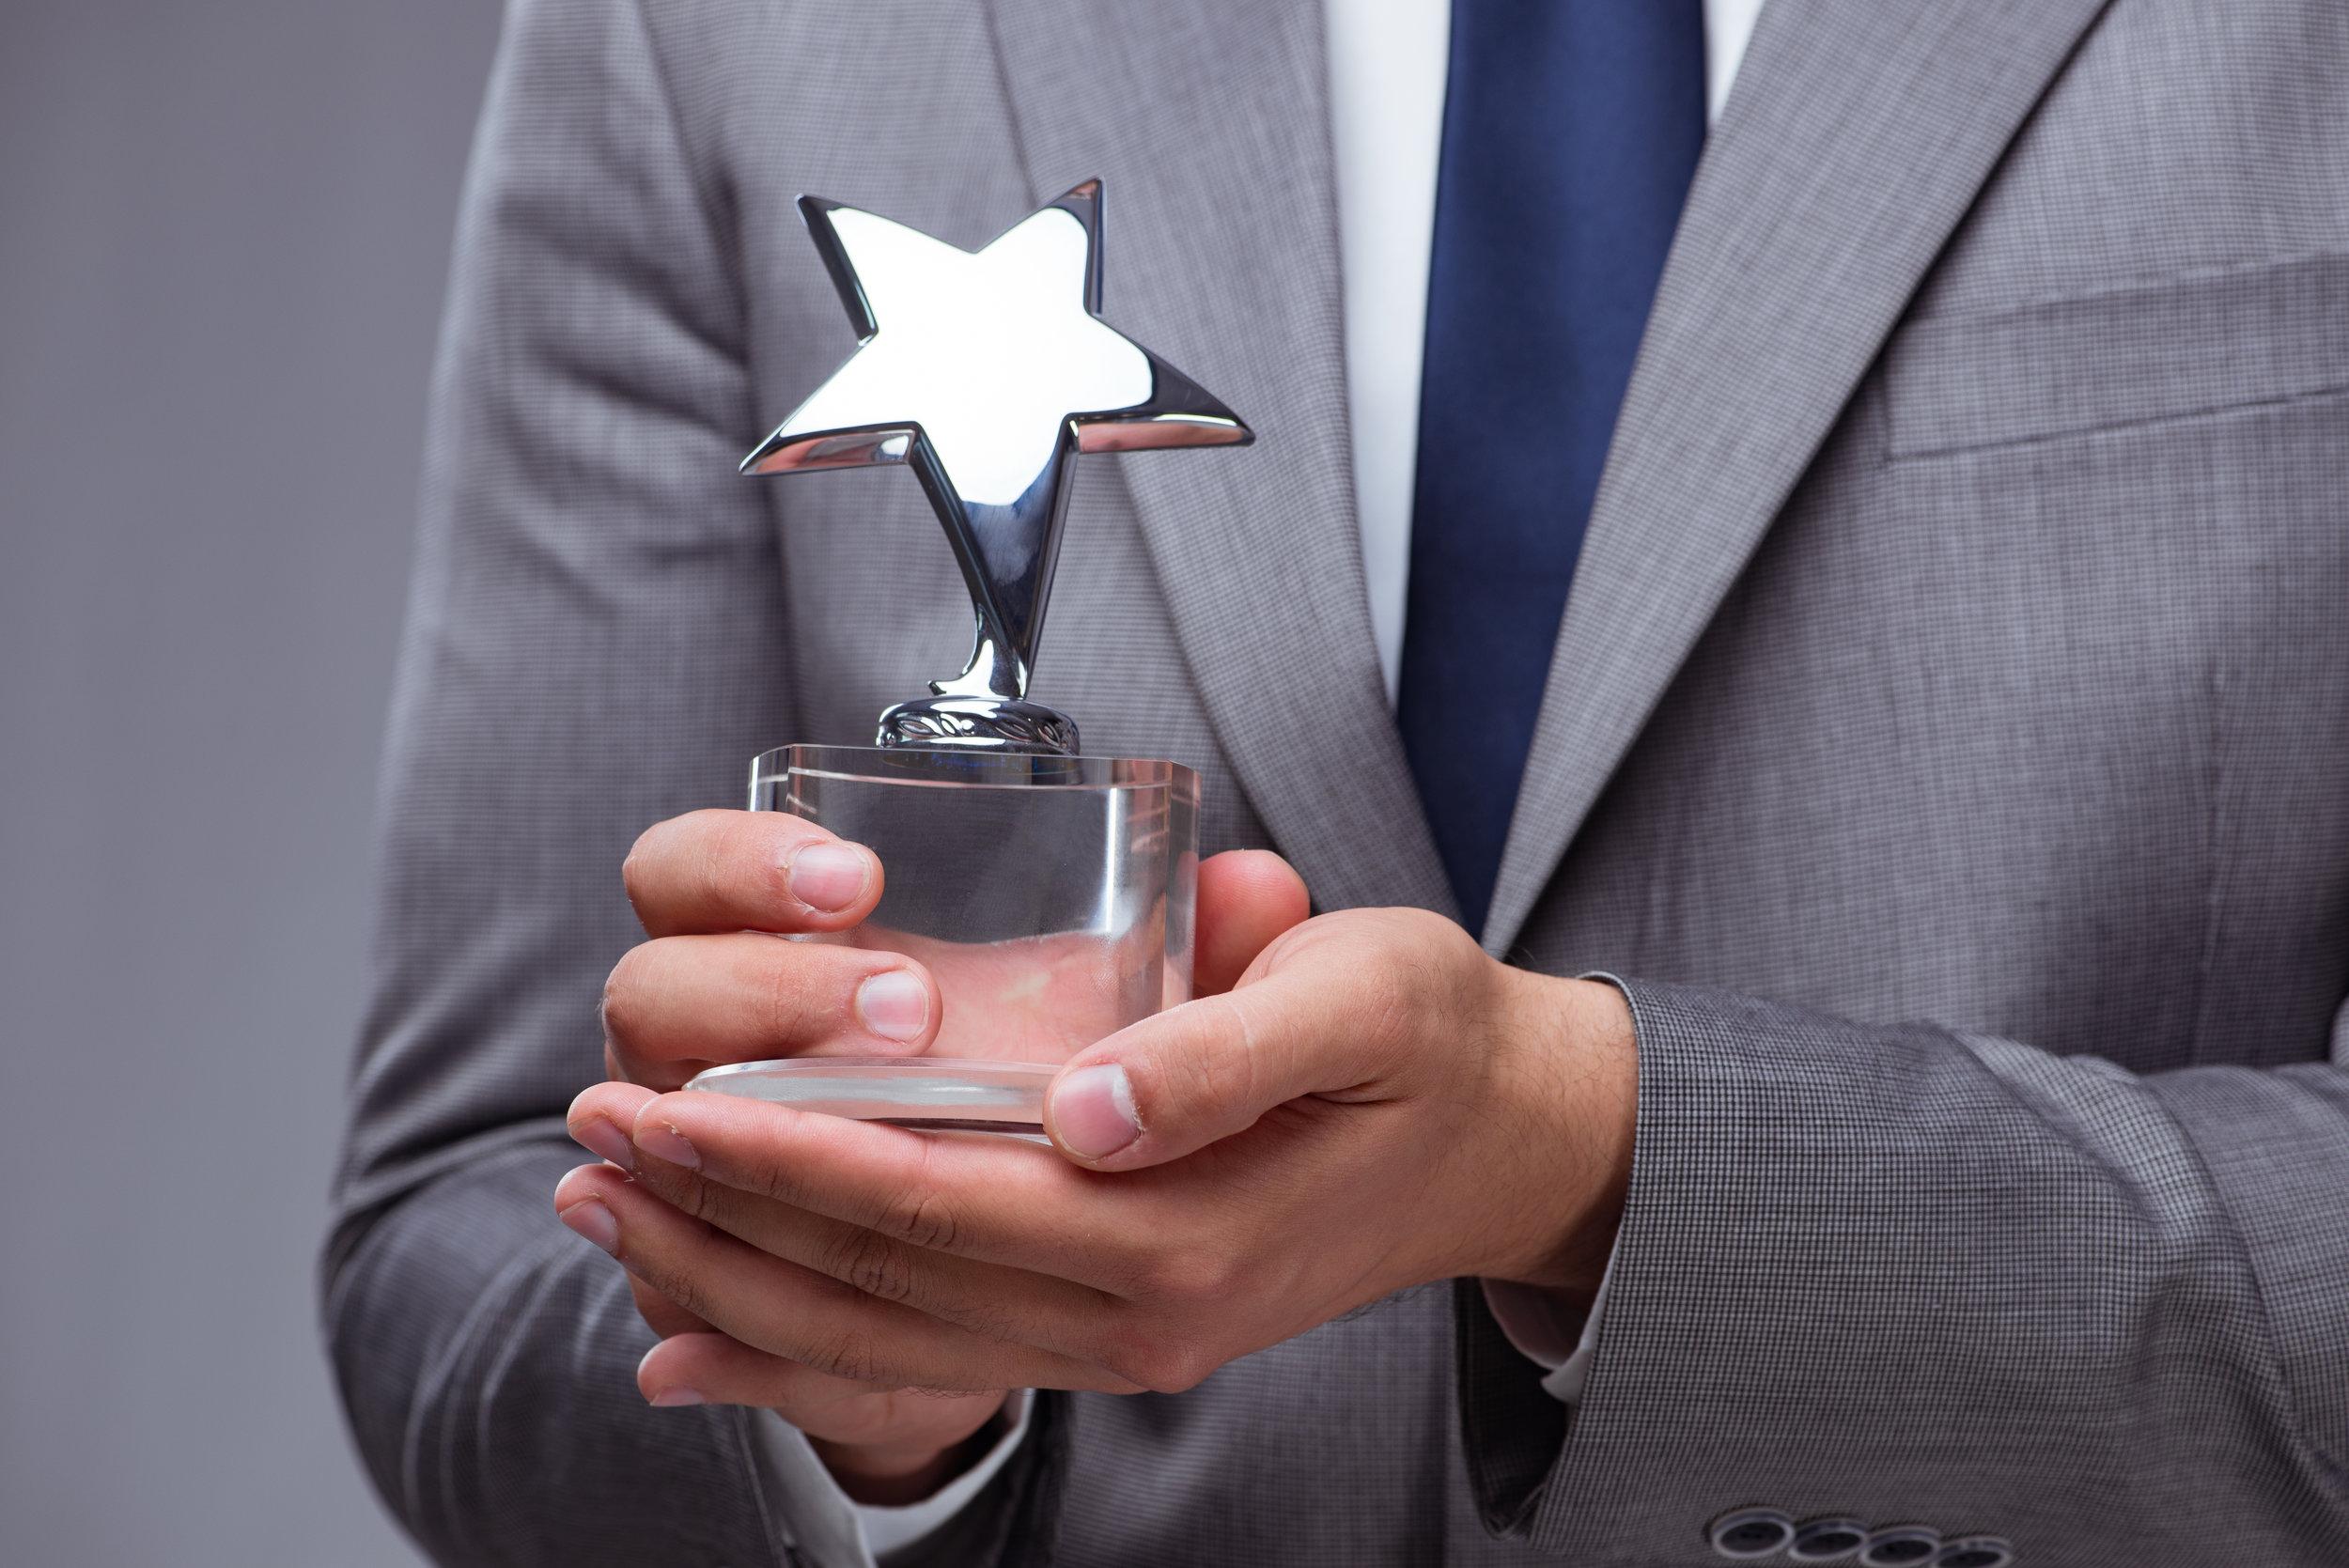 bigstock-Businessman-holding-star-award-198698806.jpg